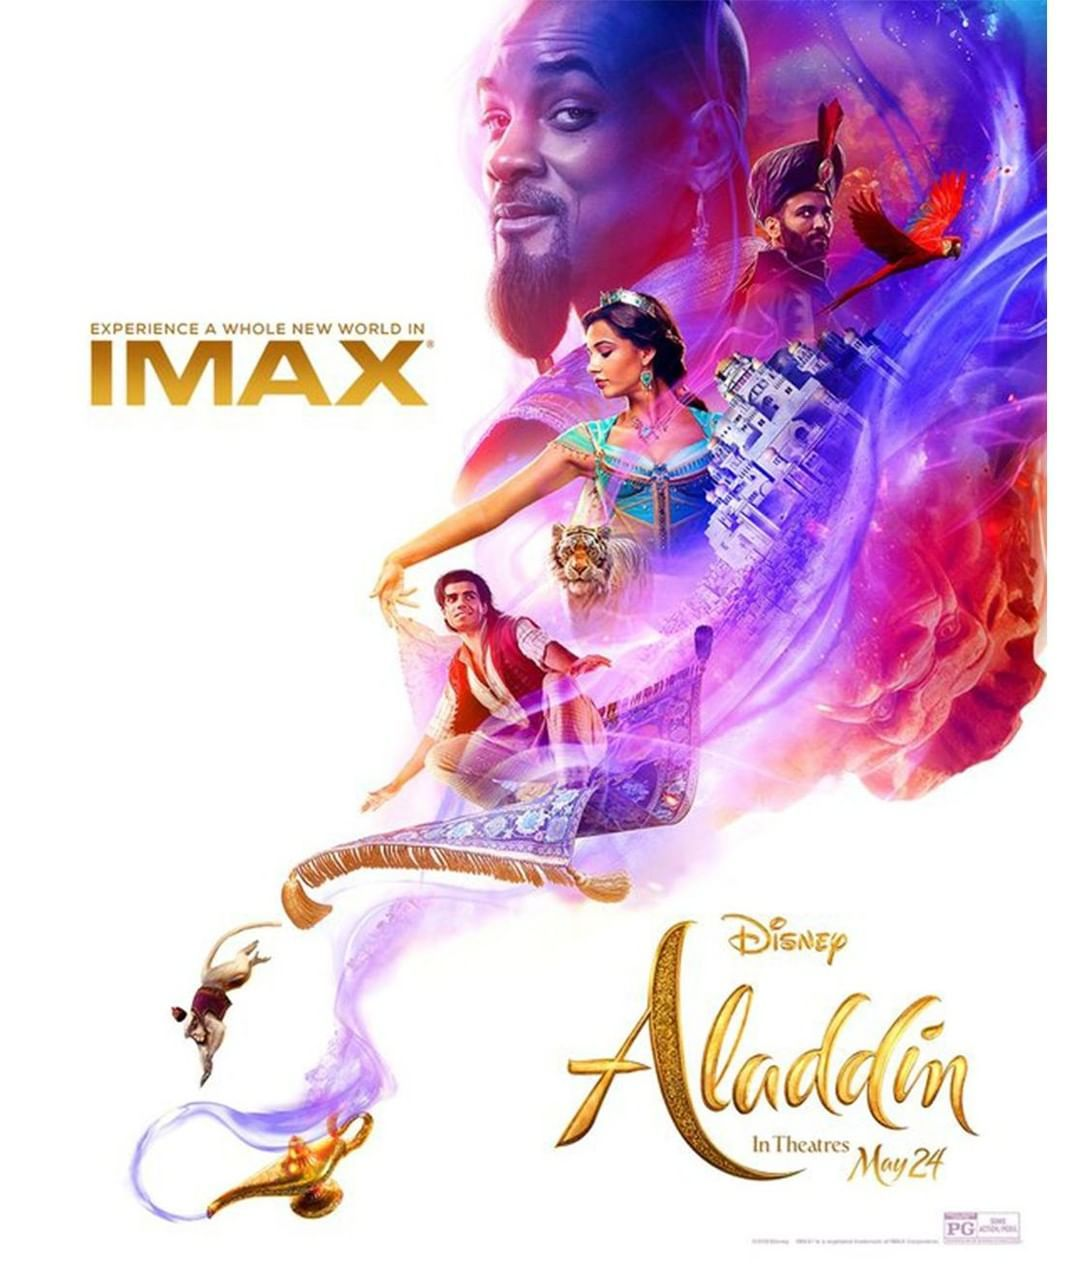 Pin By Elena On Movie Posters Aladdin Movie Aladdin Wallpaper Disney Aladdin